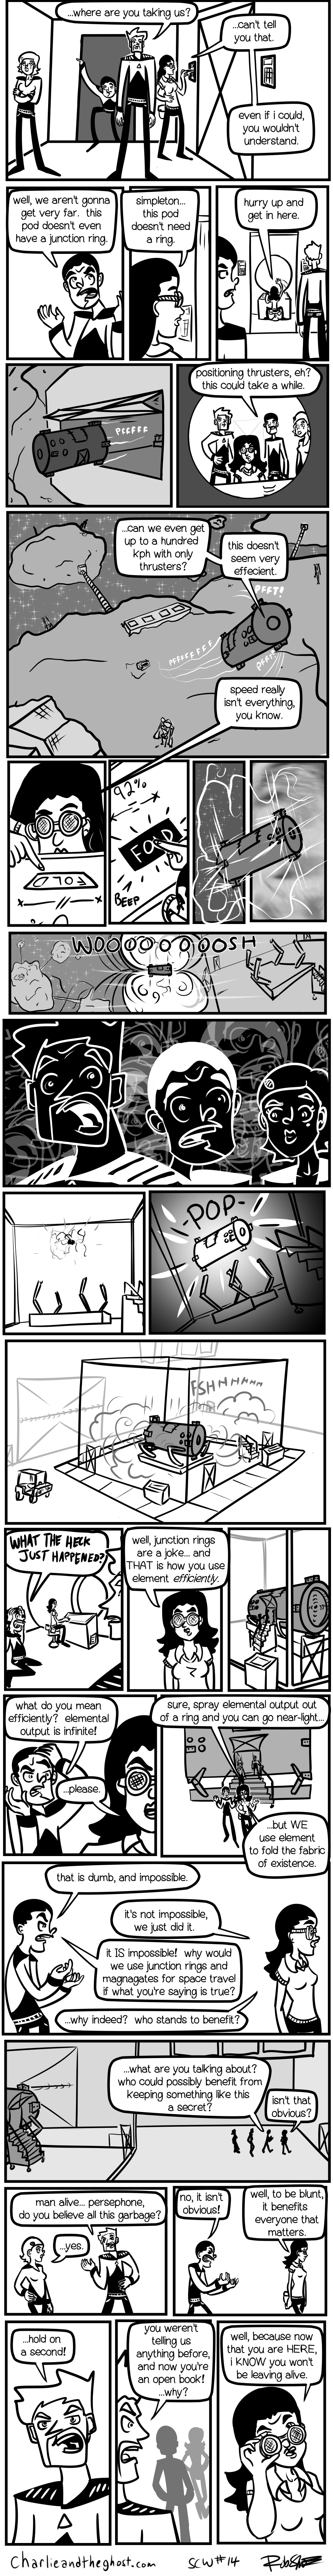 Spacechuck web 14